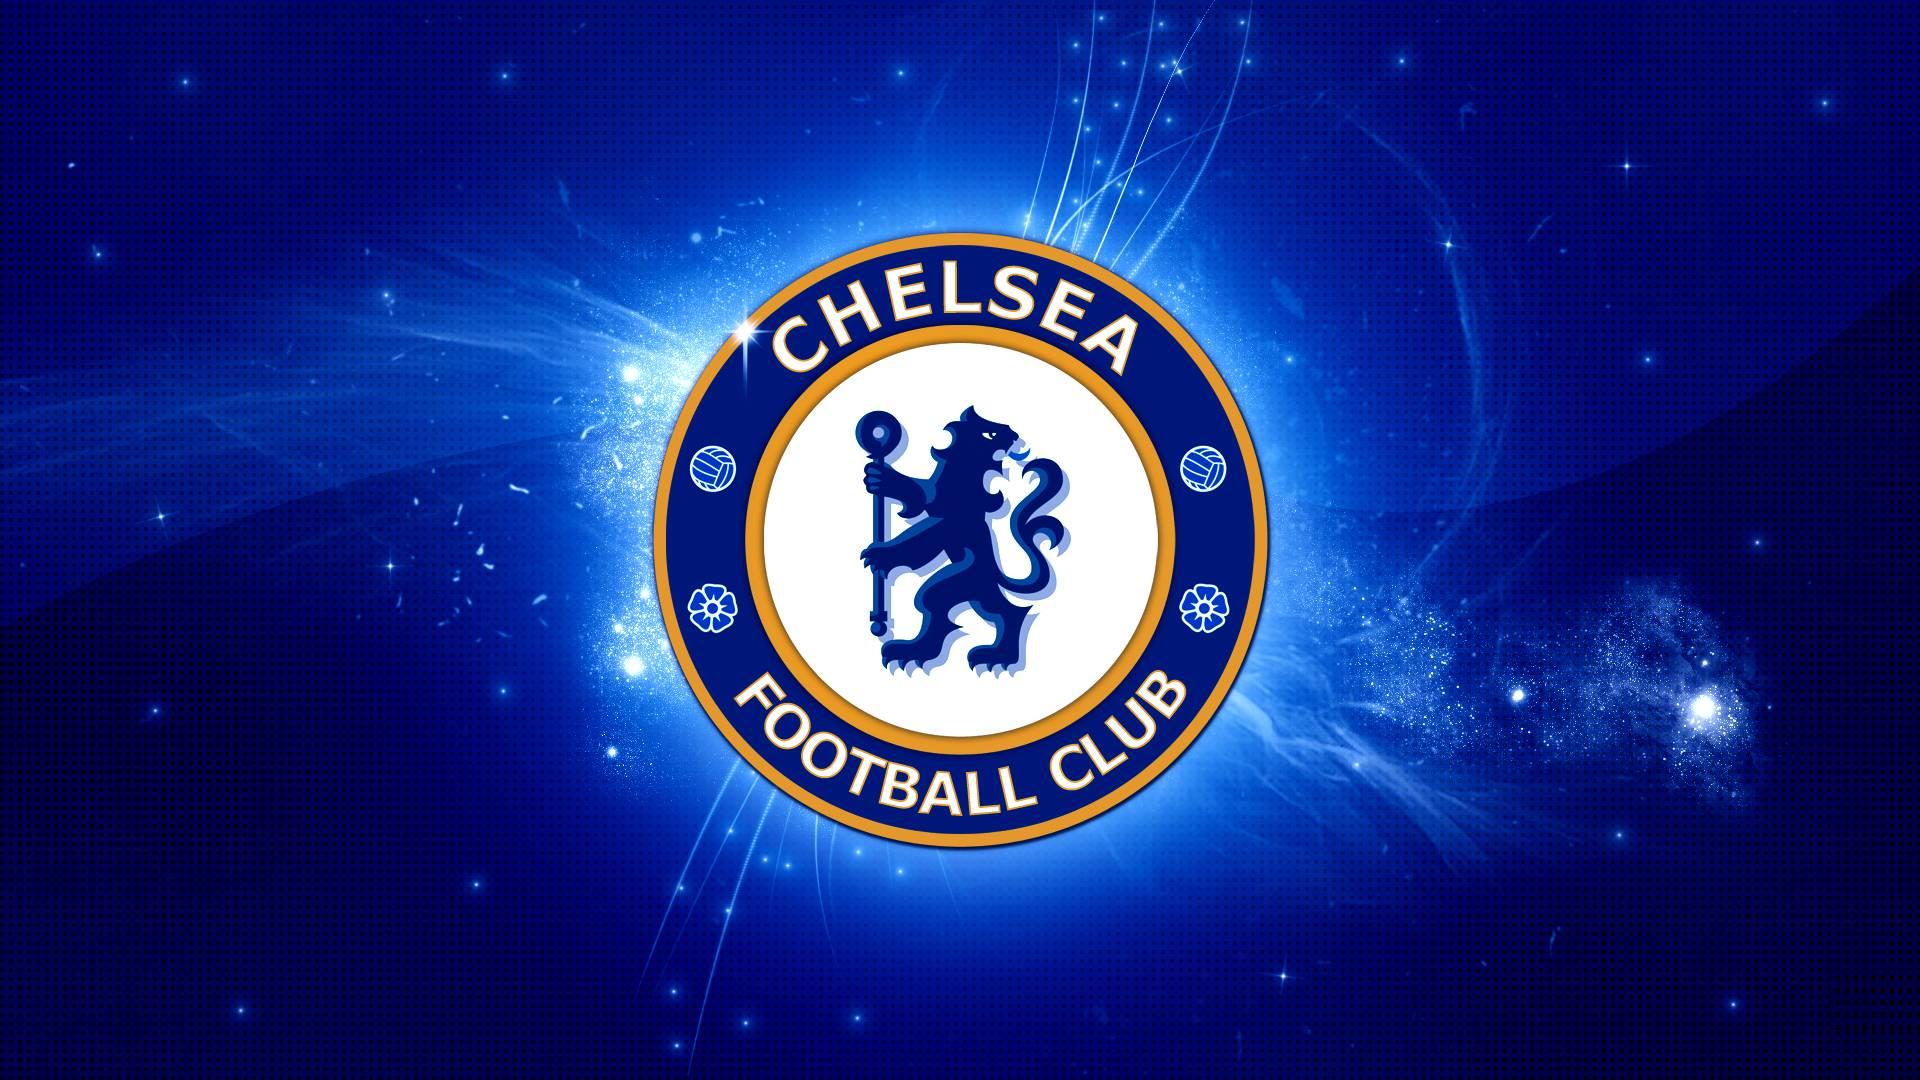 Chelsea Logo Wallpapers - Wallpaper Cave